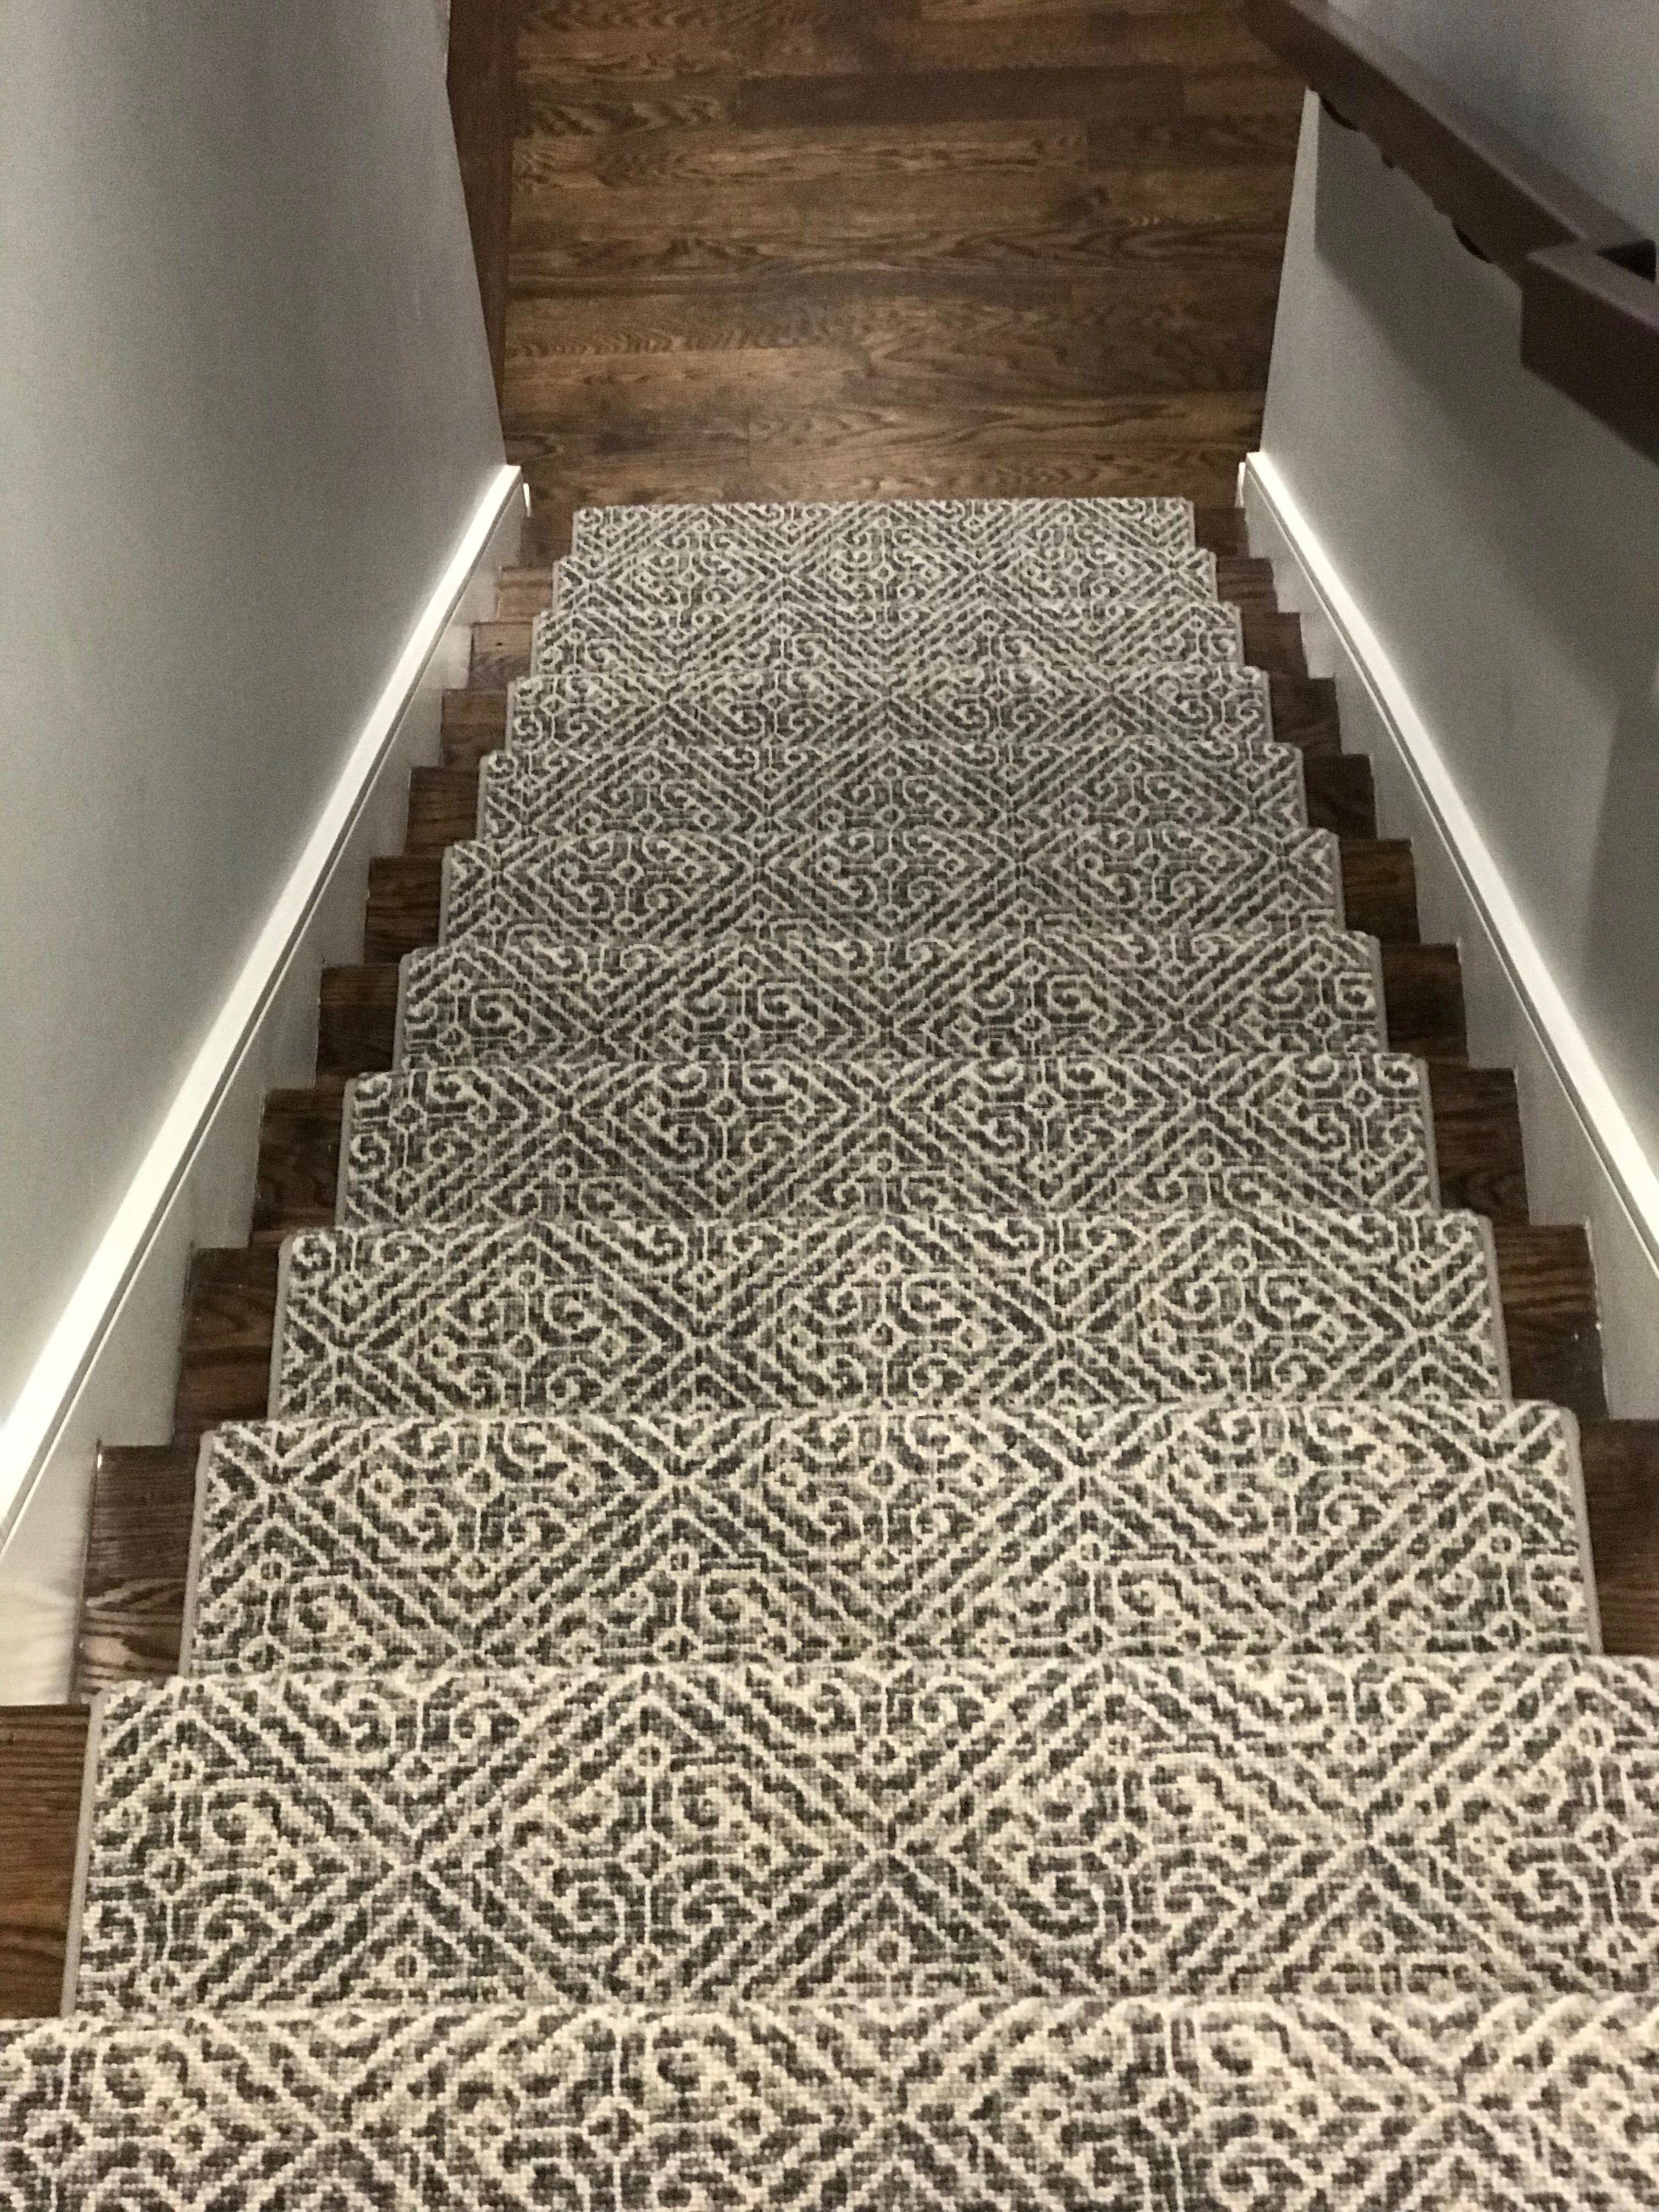 Carpet Runners End Of The Roll Carpet Stairs Stair Runner | Roll Runners For Stairs | Carpet Stair Treads | Kurdamir | Area Rugs | Flooring | Carpet Runner